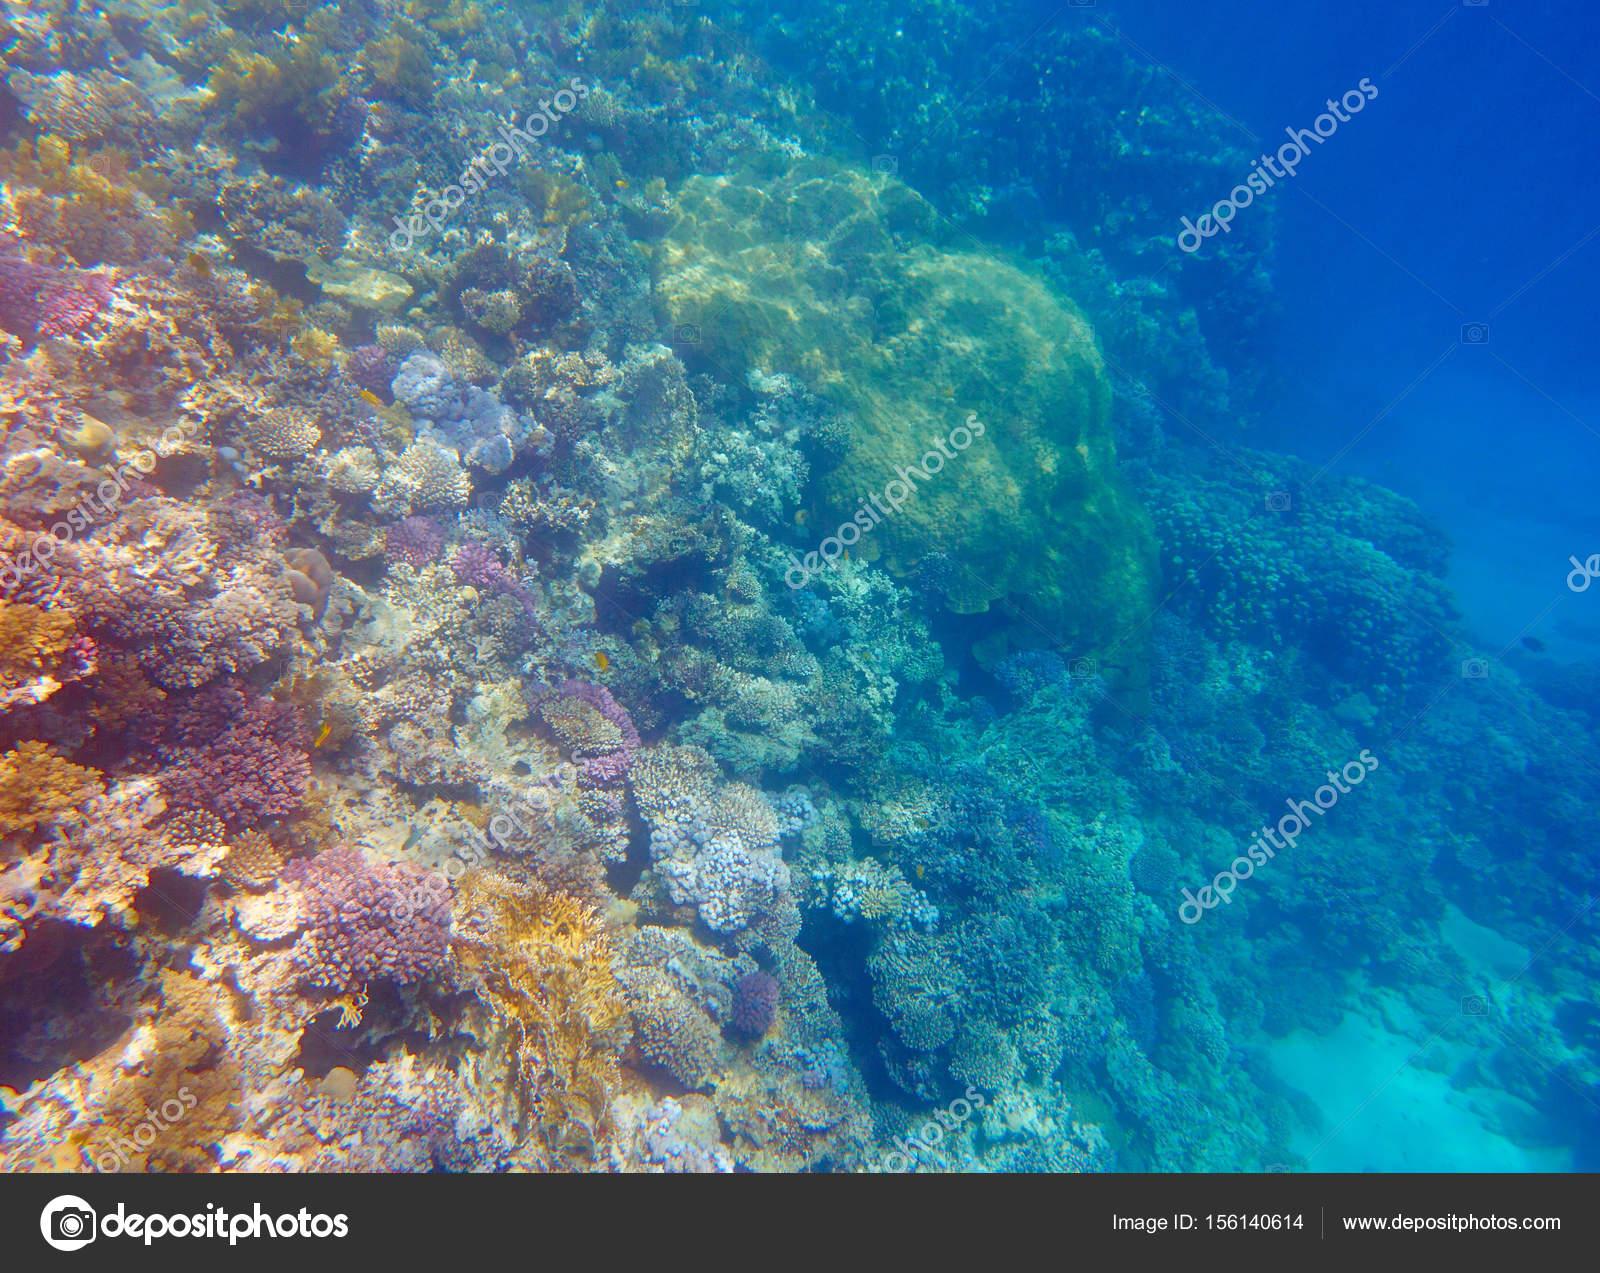 2018  u3011  ud83e udd19 images of coral reefs